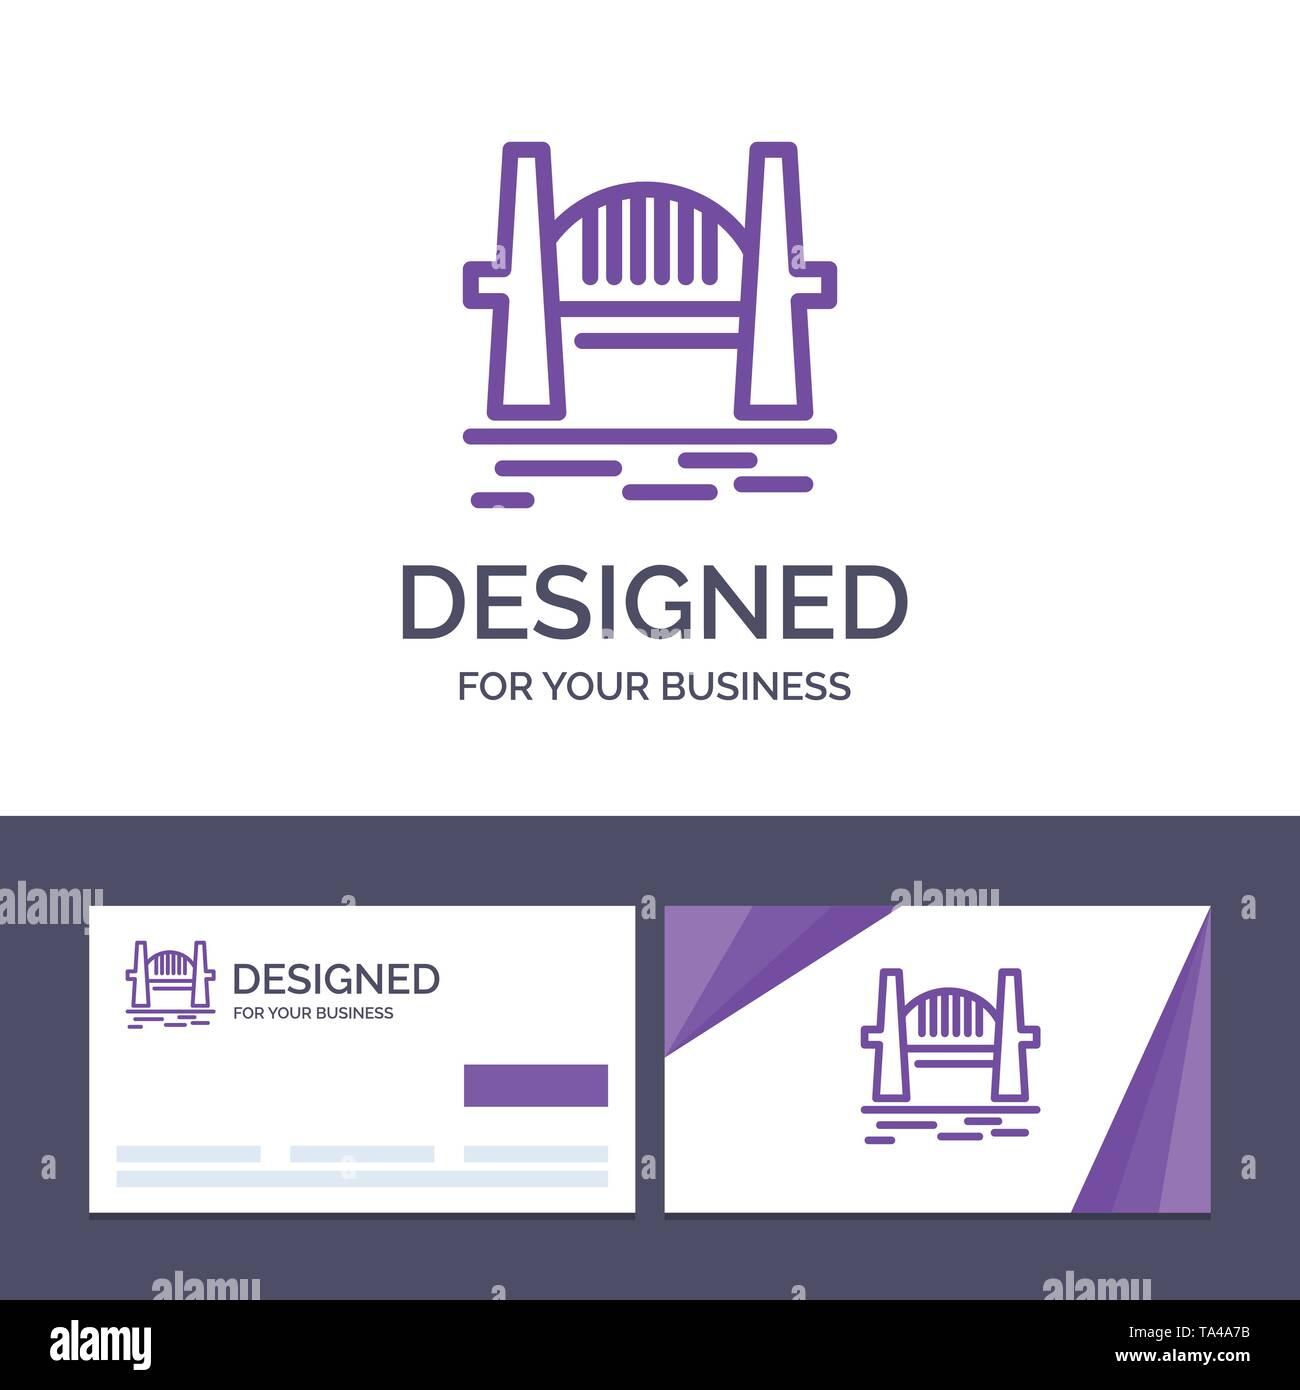 Creative Business Card and Logo template Australia, Bridge, City sets, Harbor, Sydney Vector Illustration - Stock Image